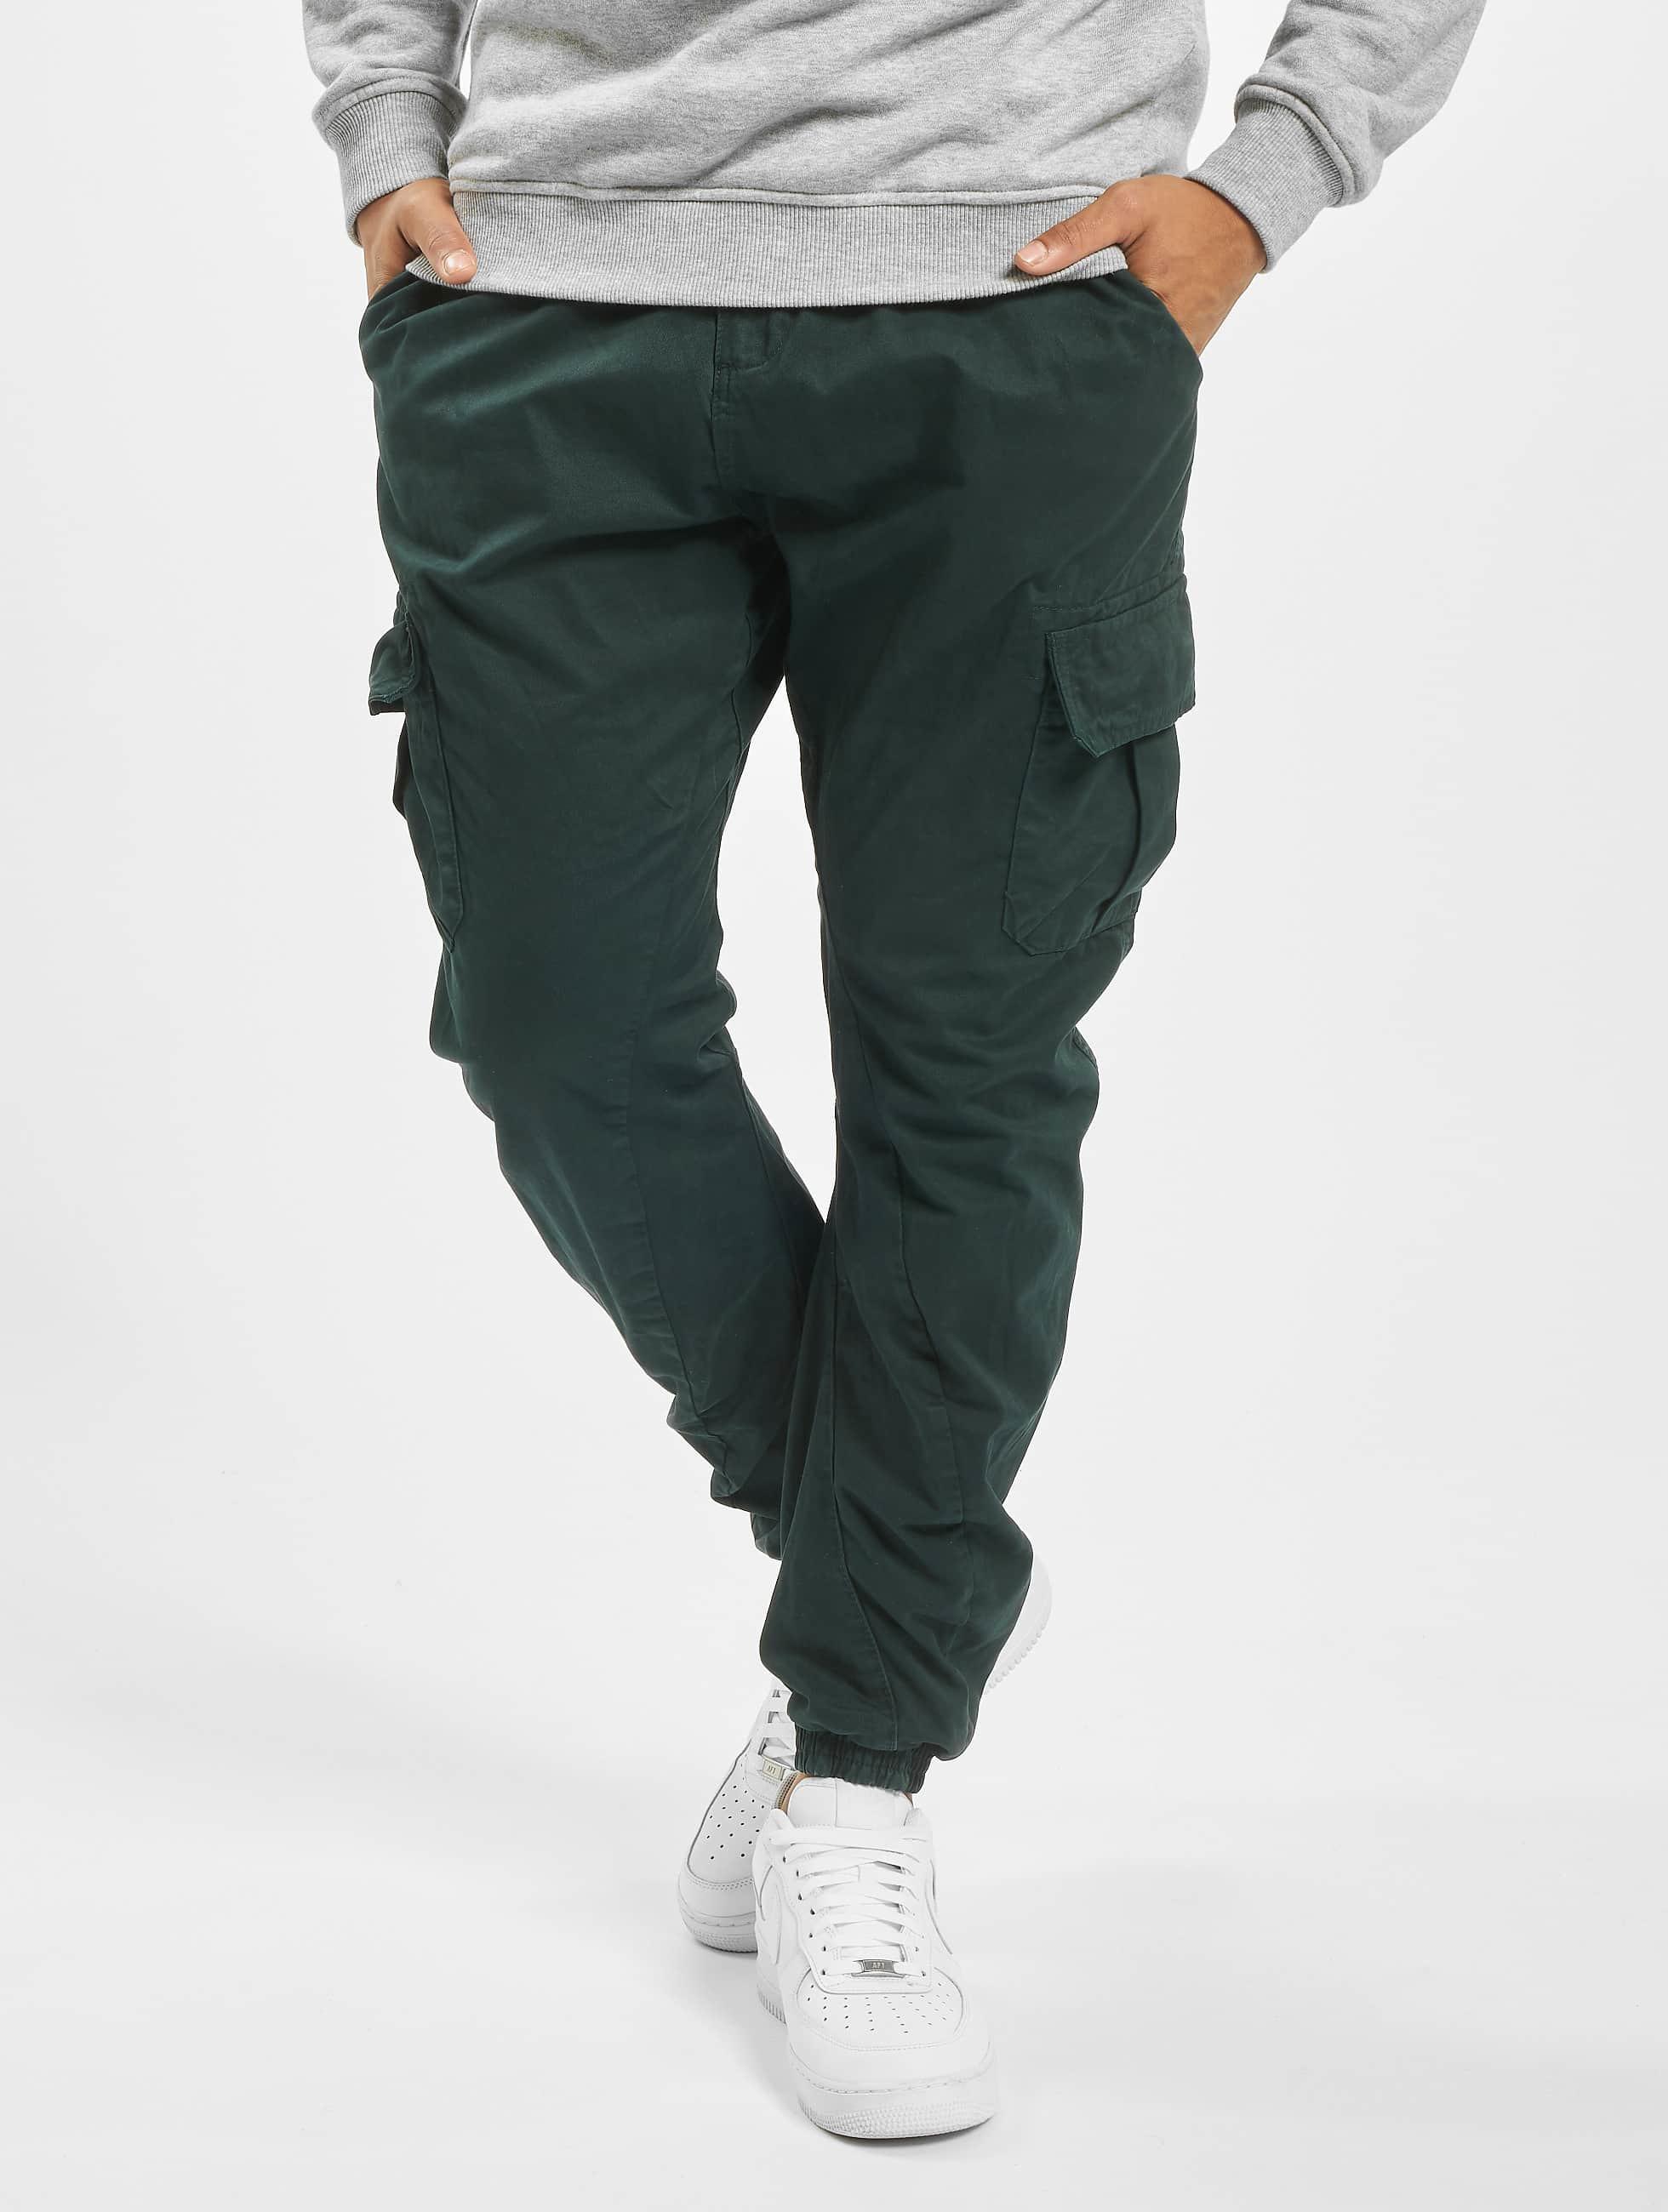 Urban Classics Cargo Sweat Pants Bottlegreen